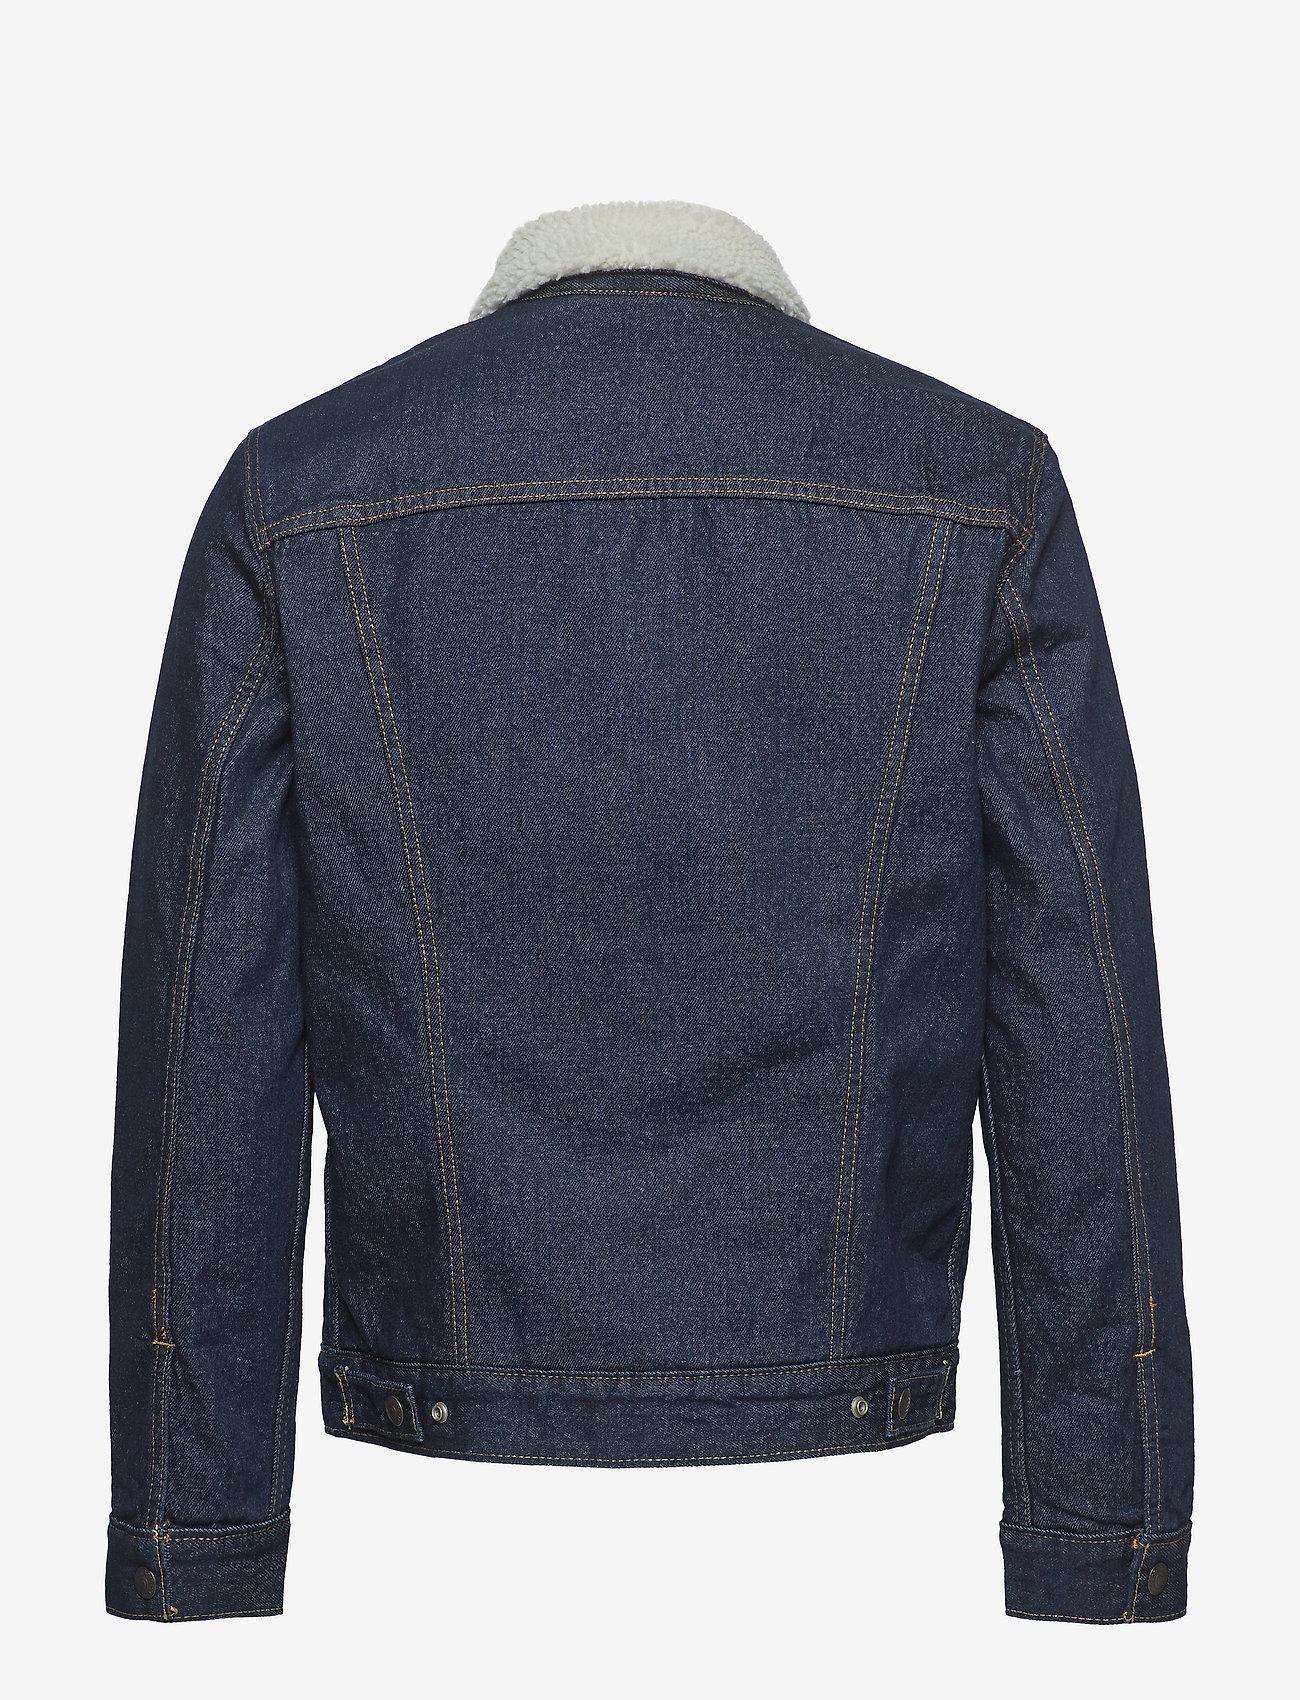 LEVI´S Men - TYPE 3 SHERPA TRUCKER ROCKRIDG - jeansjackor - med indigo - worn in - 1